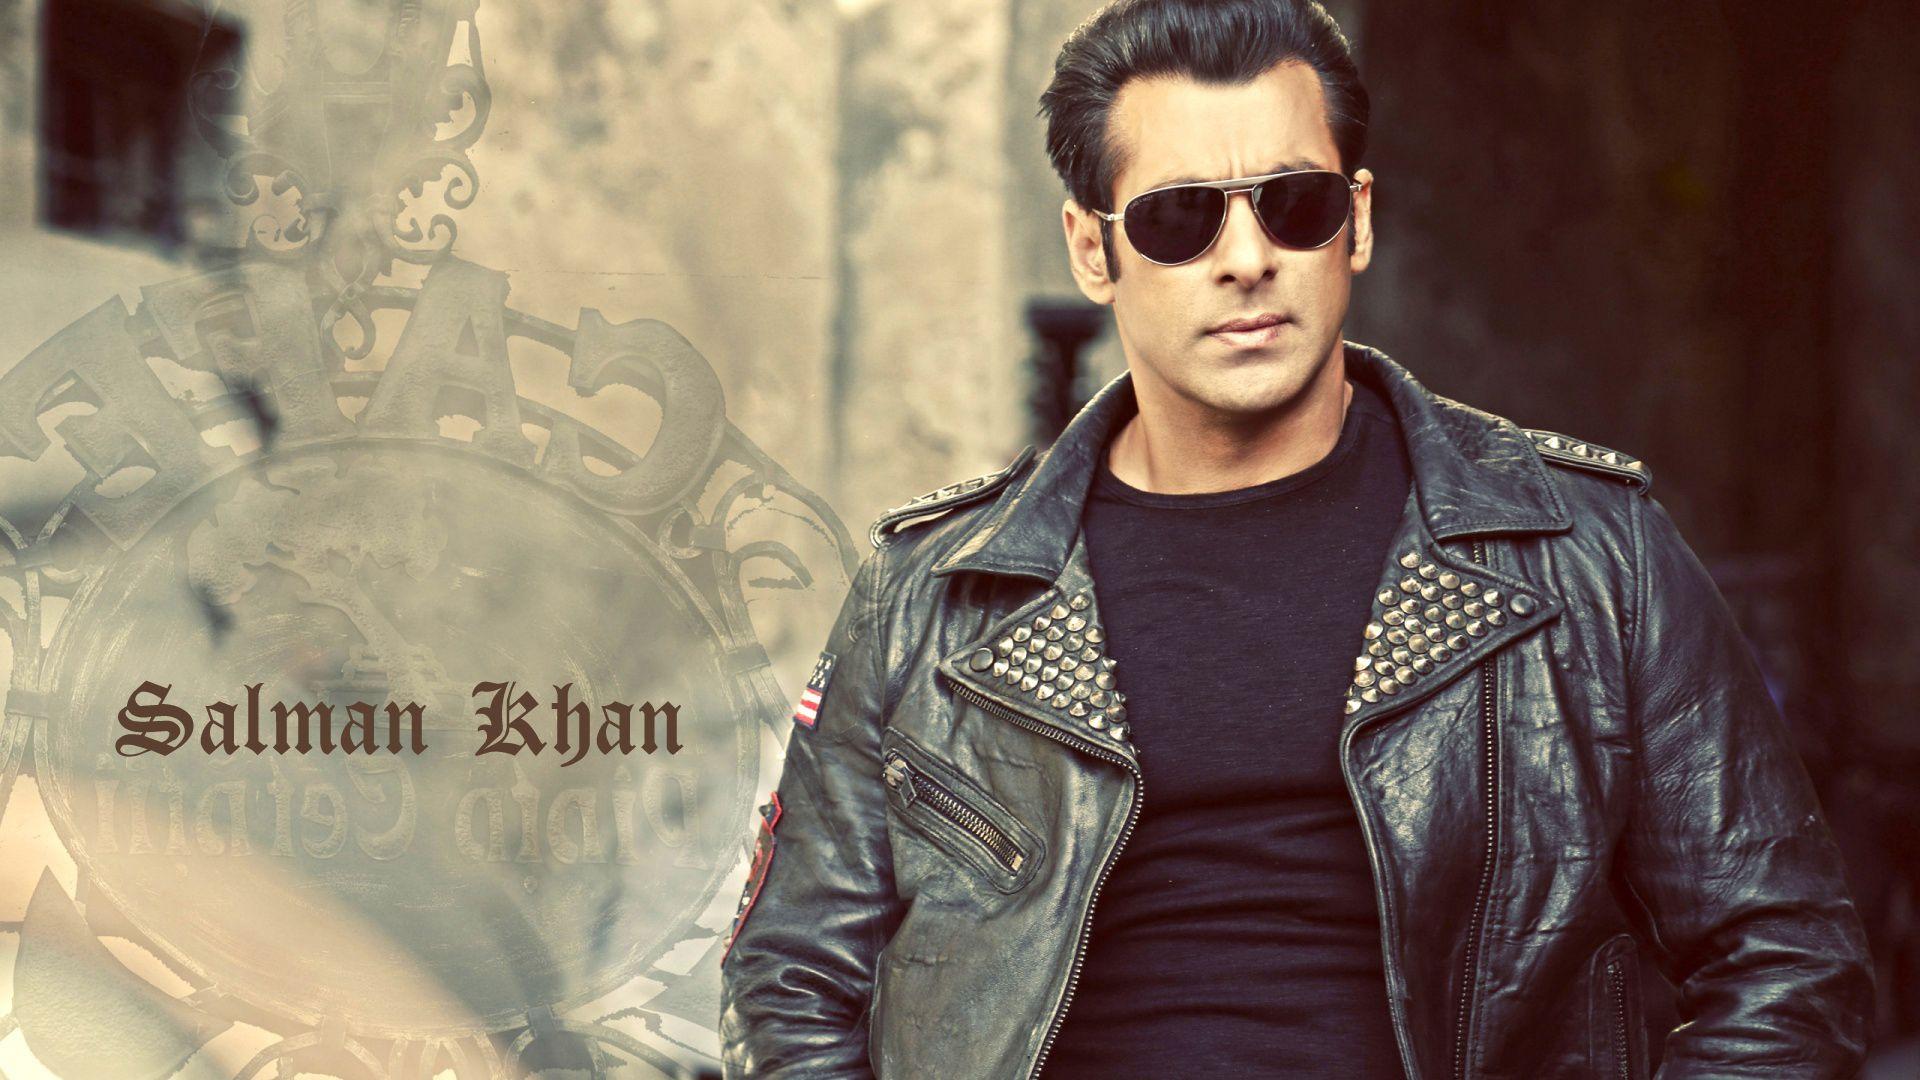 Wallpaper download bollywood actors - Bollywood Actors Salman Khan Hd Wallpapers 1080p